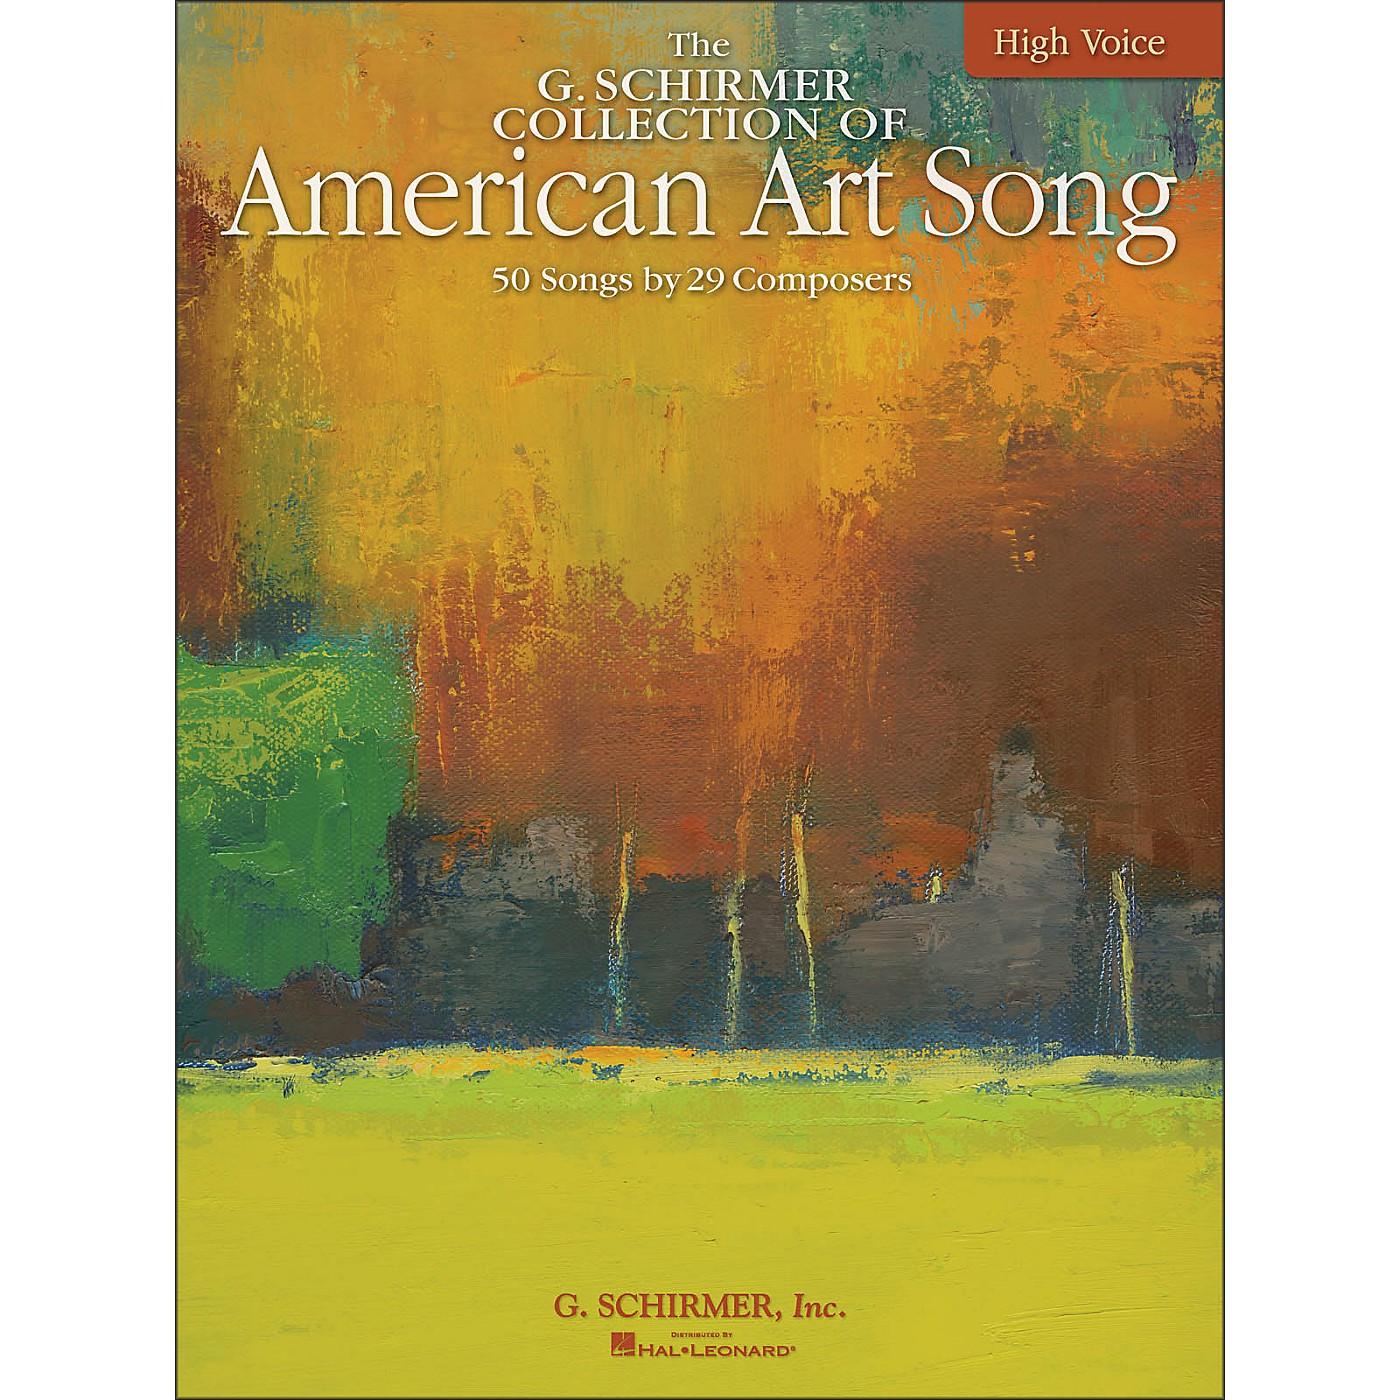 G. Schirmer American Art Song - The G. Schirmer Collection for High Voice thumbnail